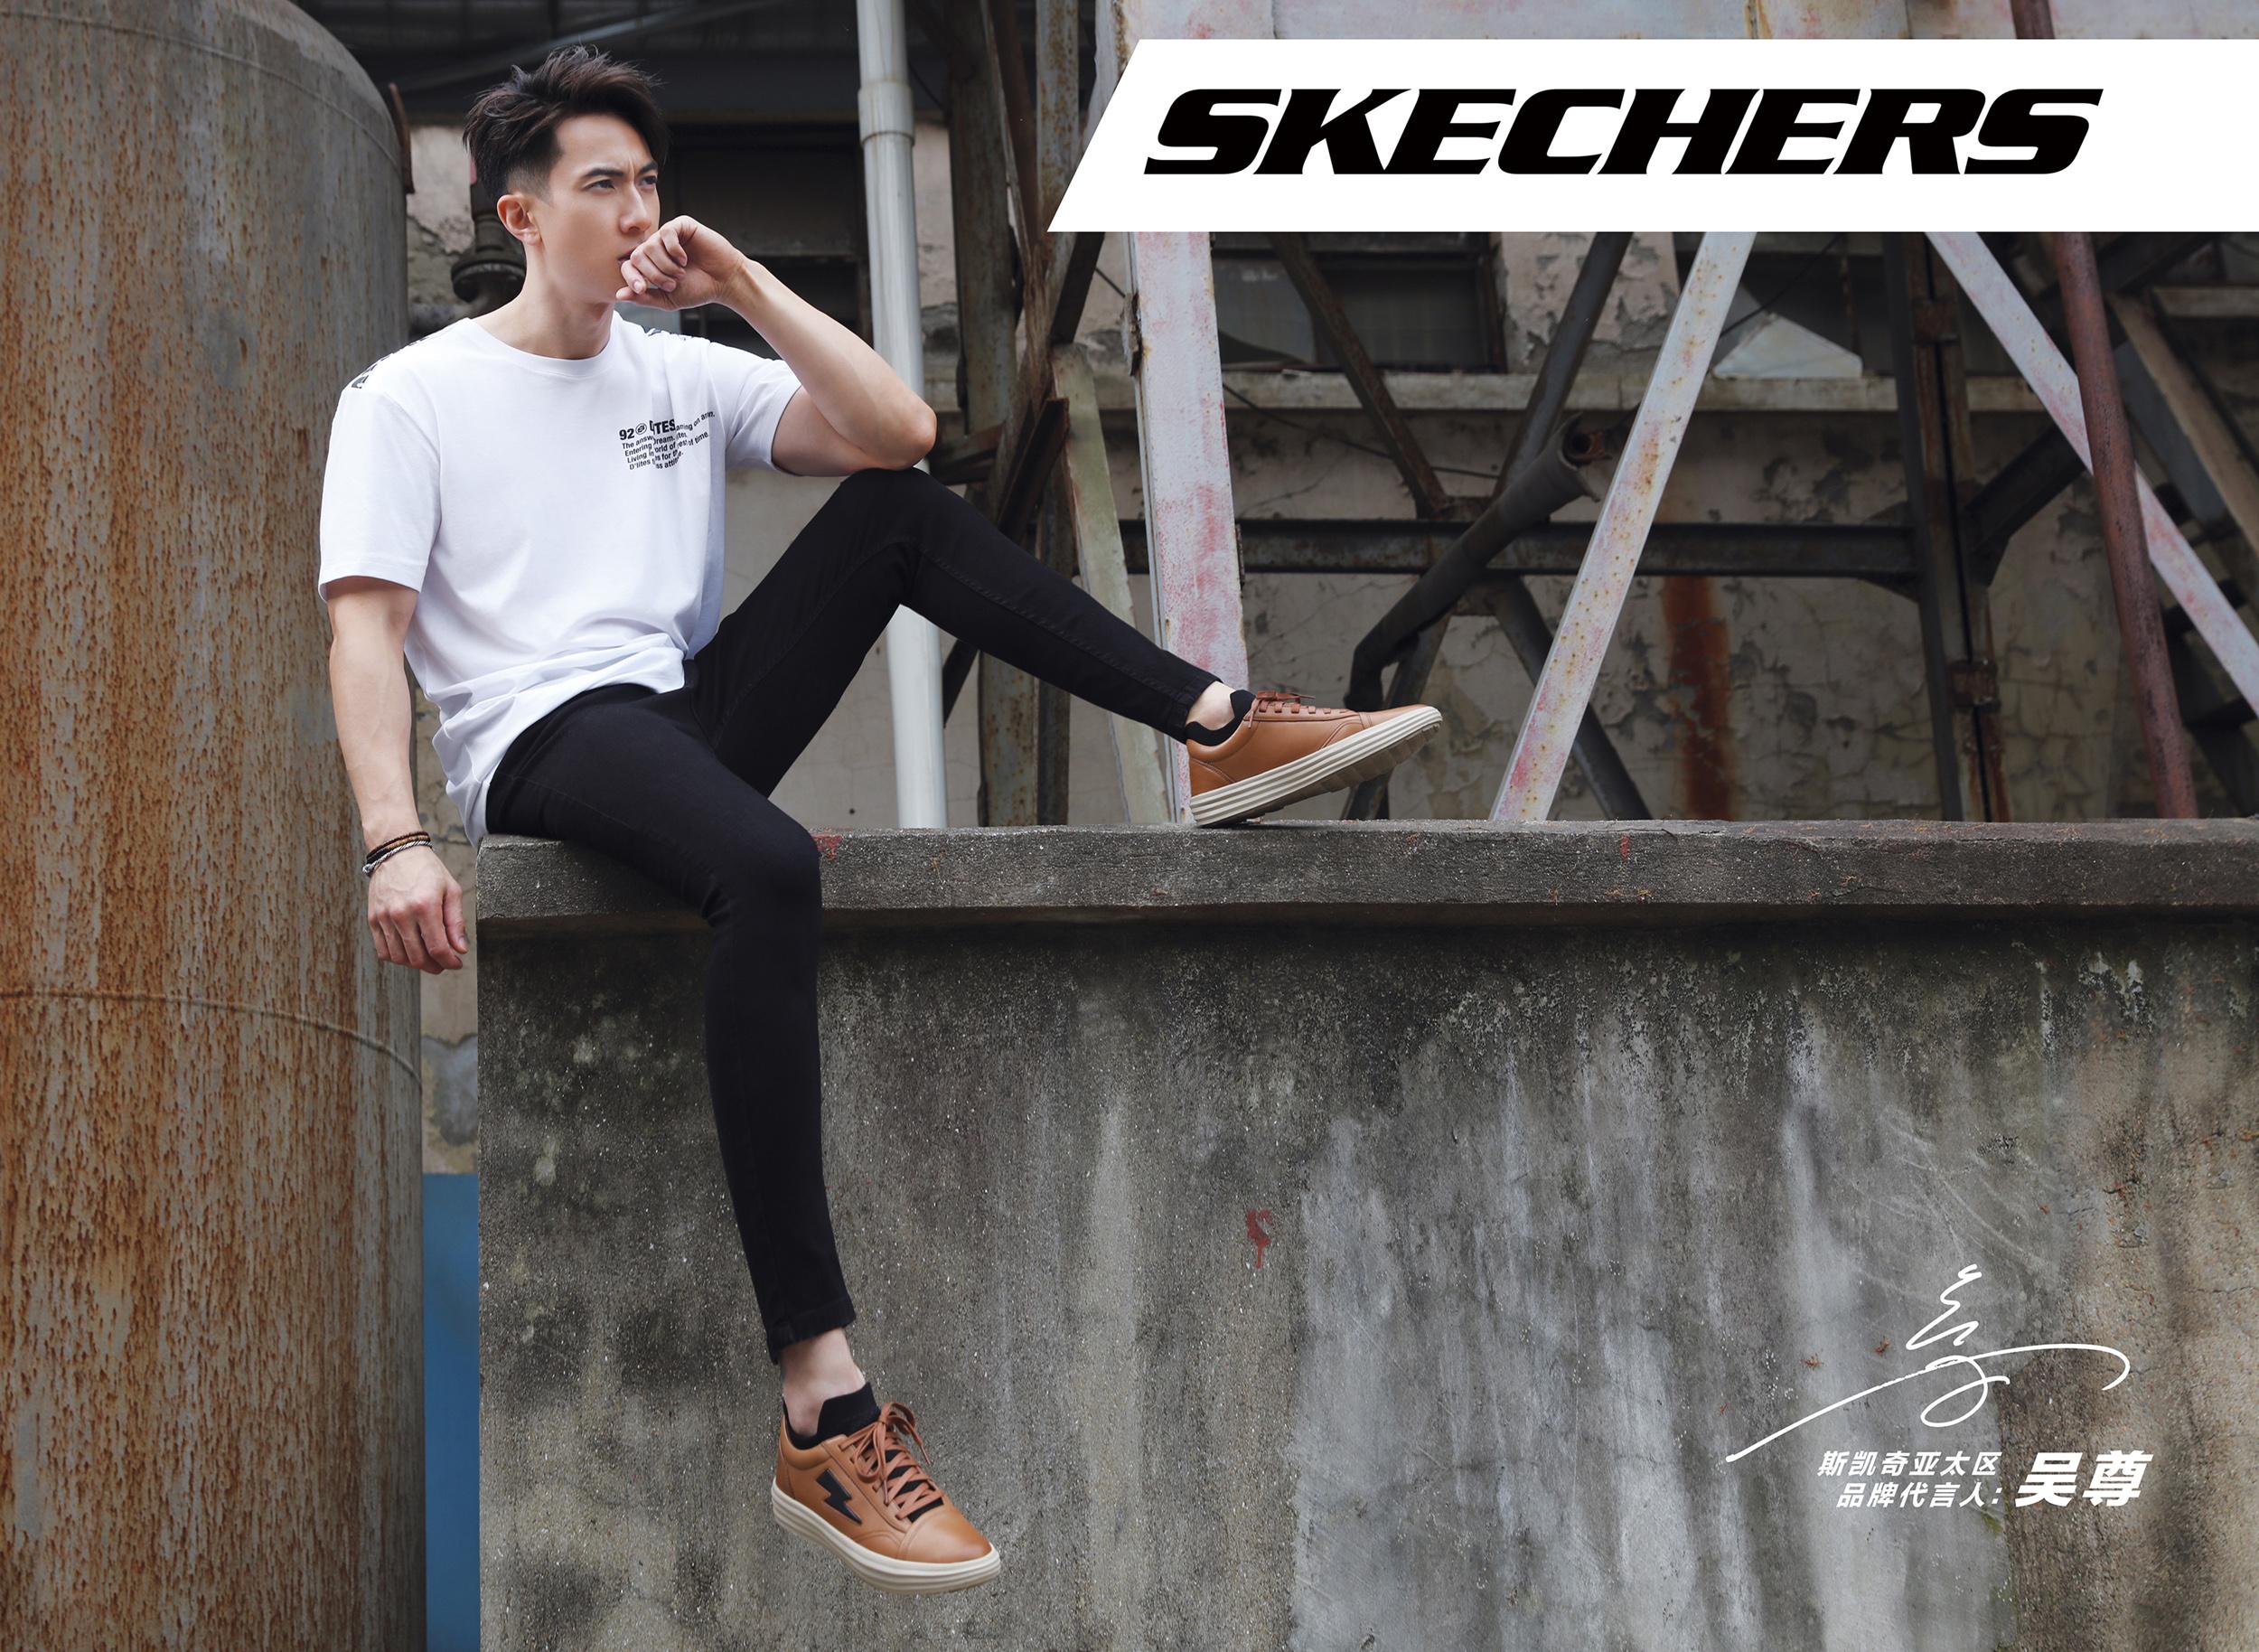 Skechers_2019Q3Q4_6_h